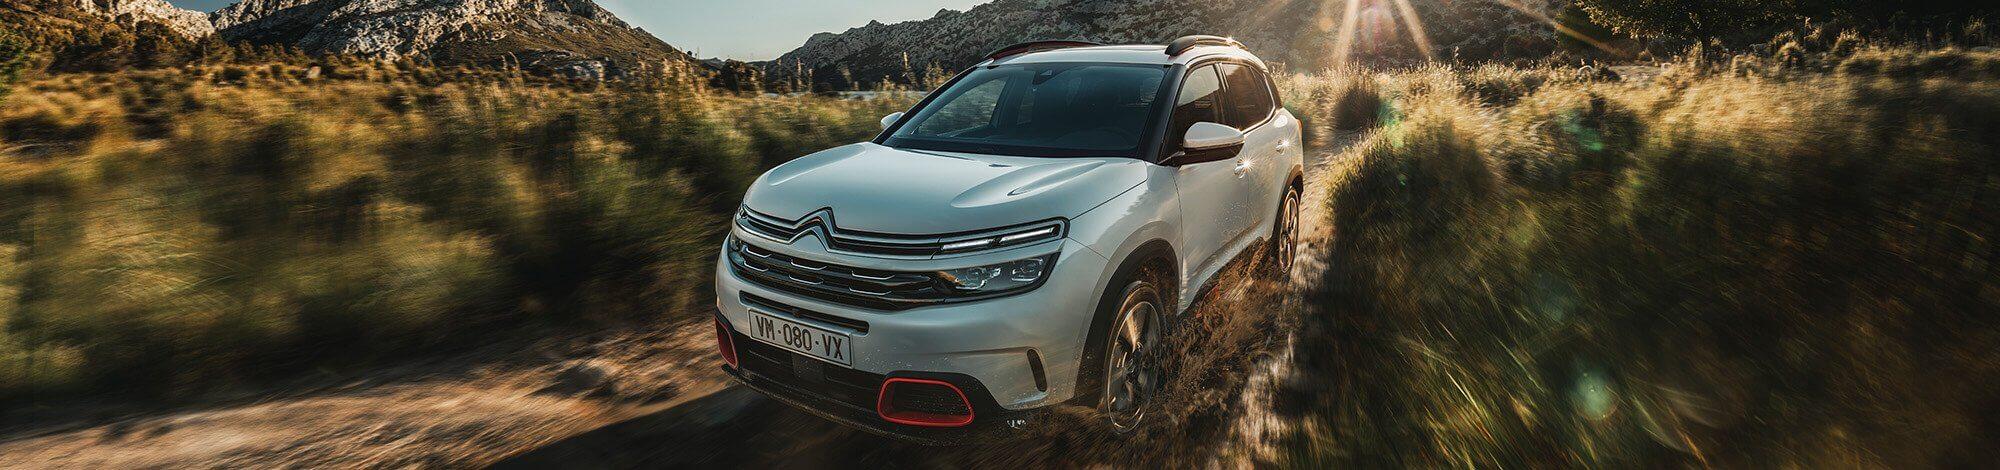 Nieuwe SUV Citroën